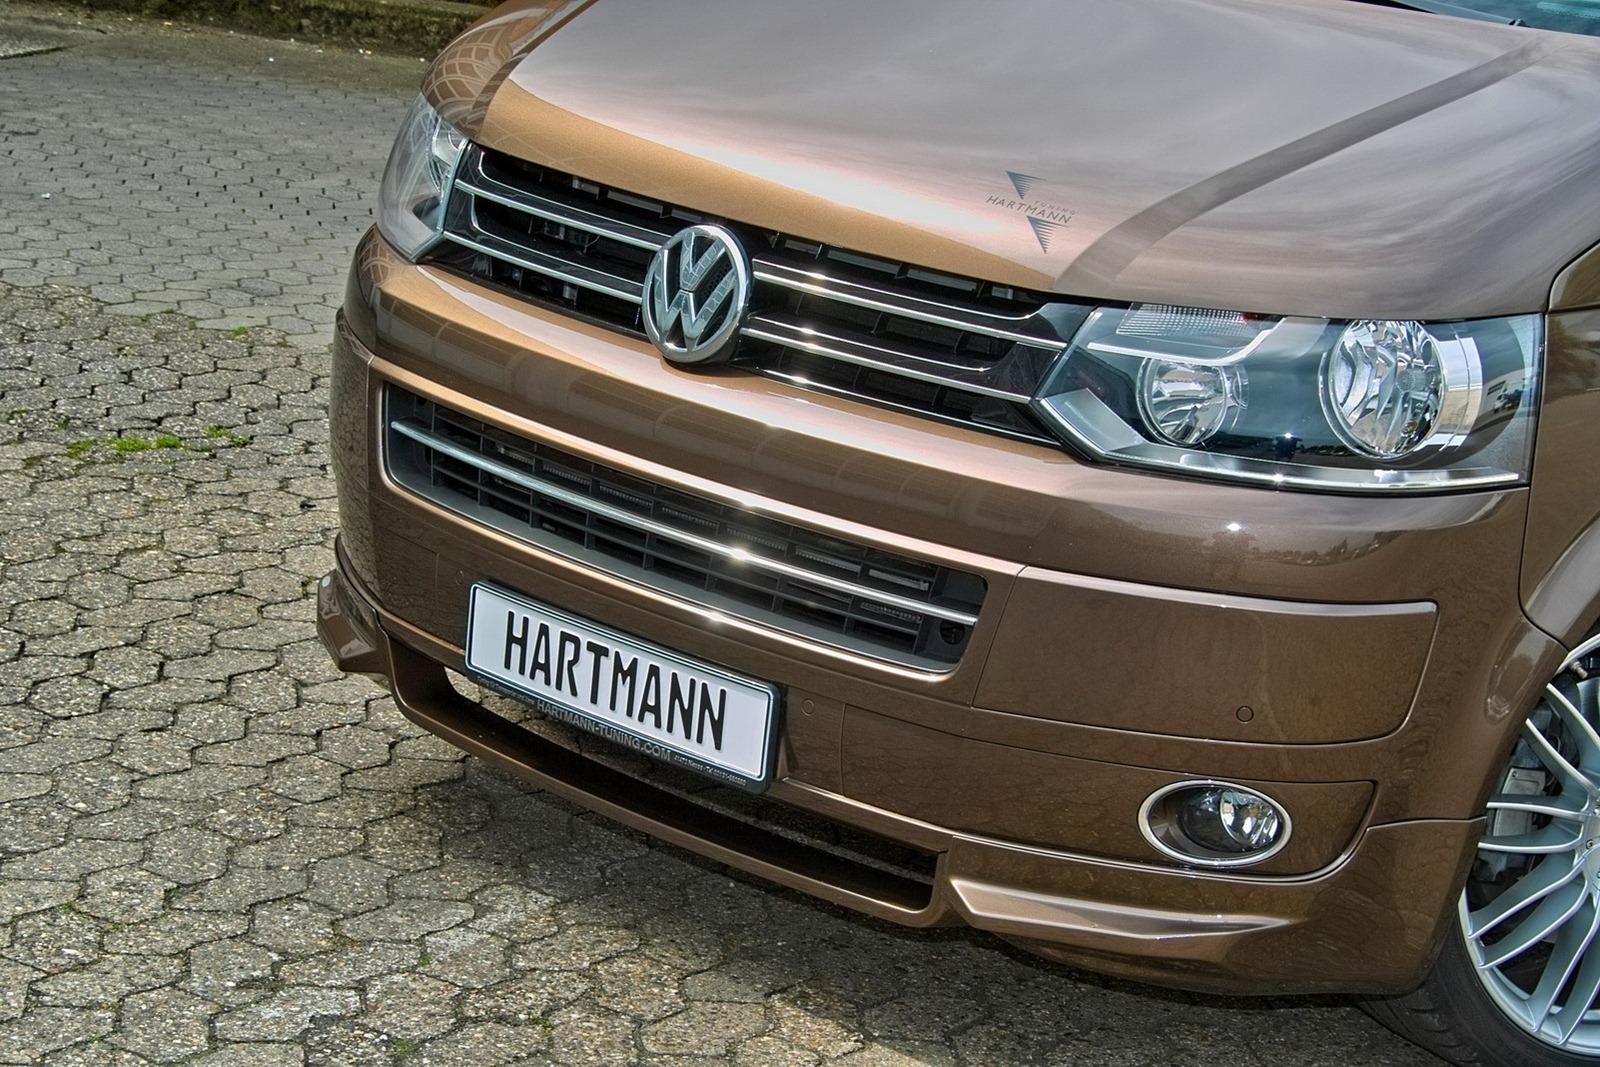 Volkswagen Transporter T5 Made Even Cooler by Hartmann - autoevolution